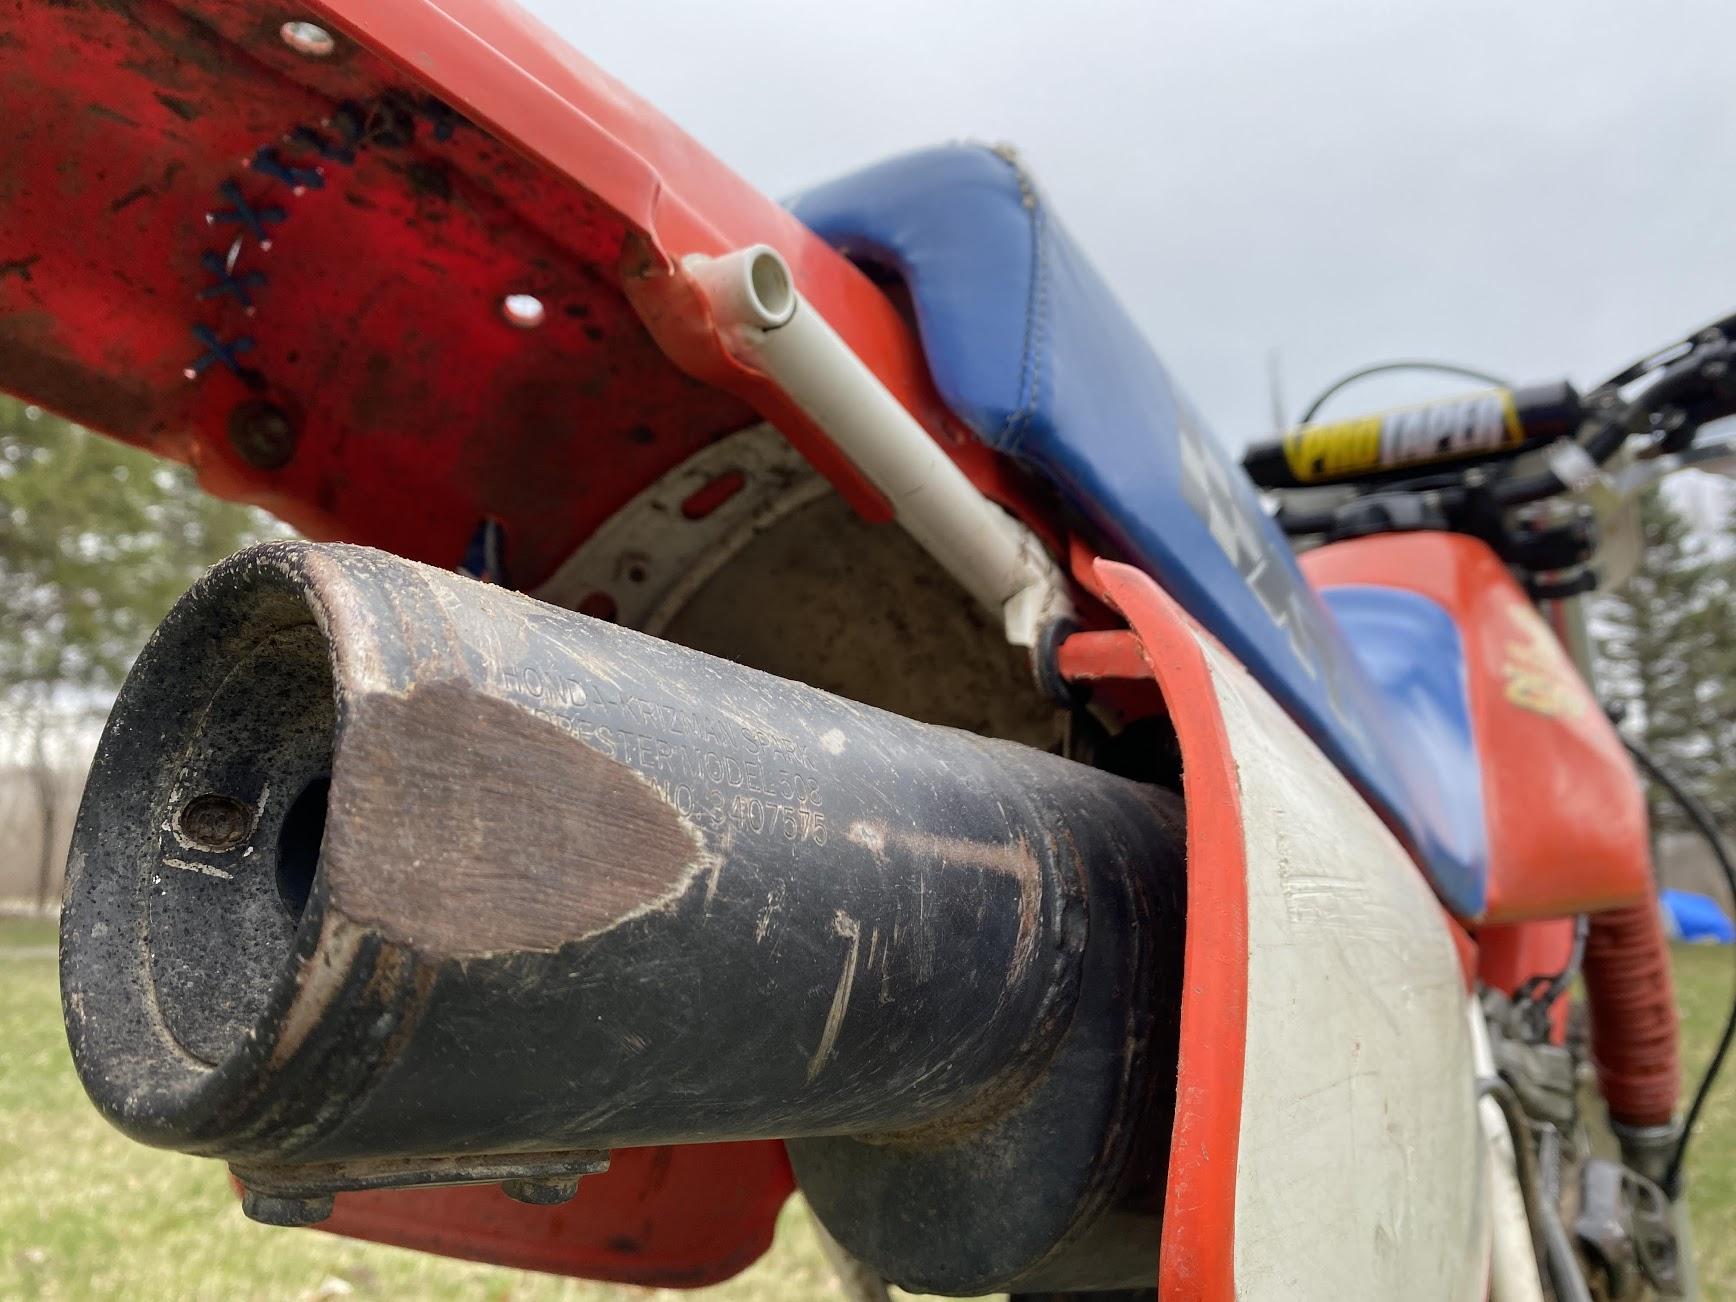 Honda Xr250 exhaust damage